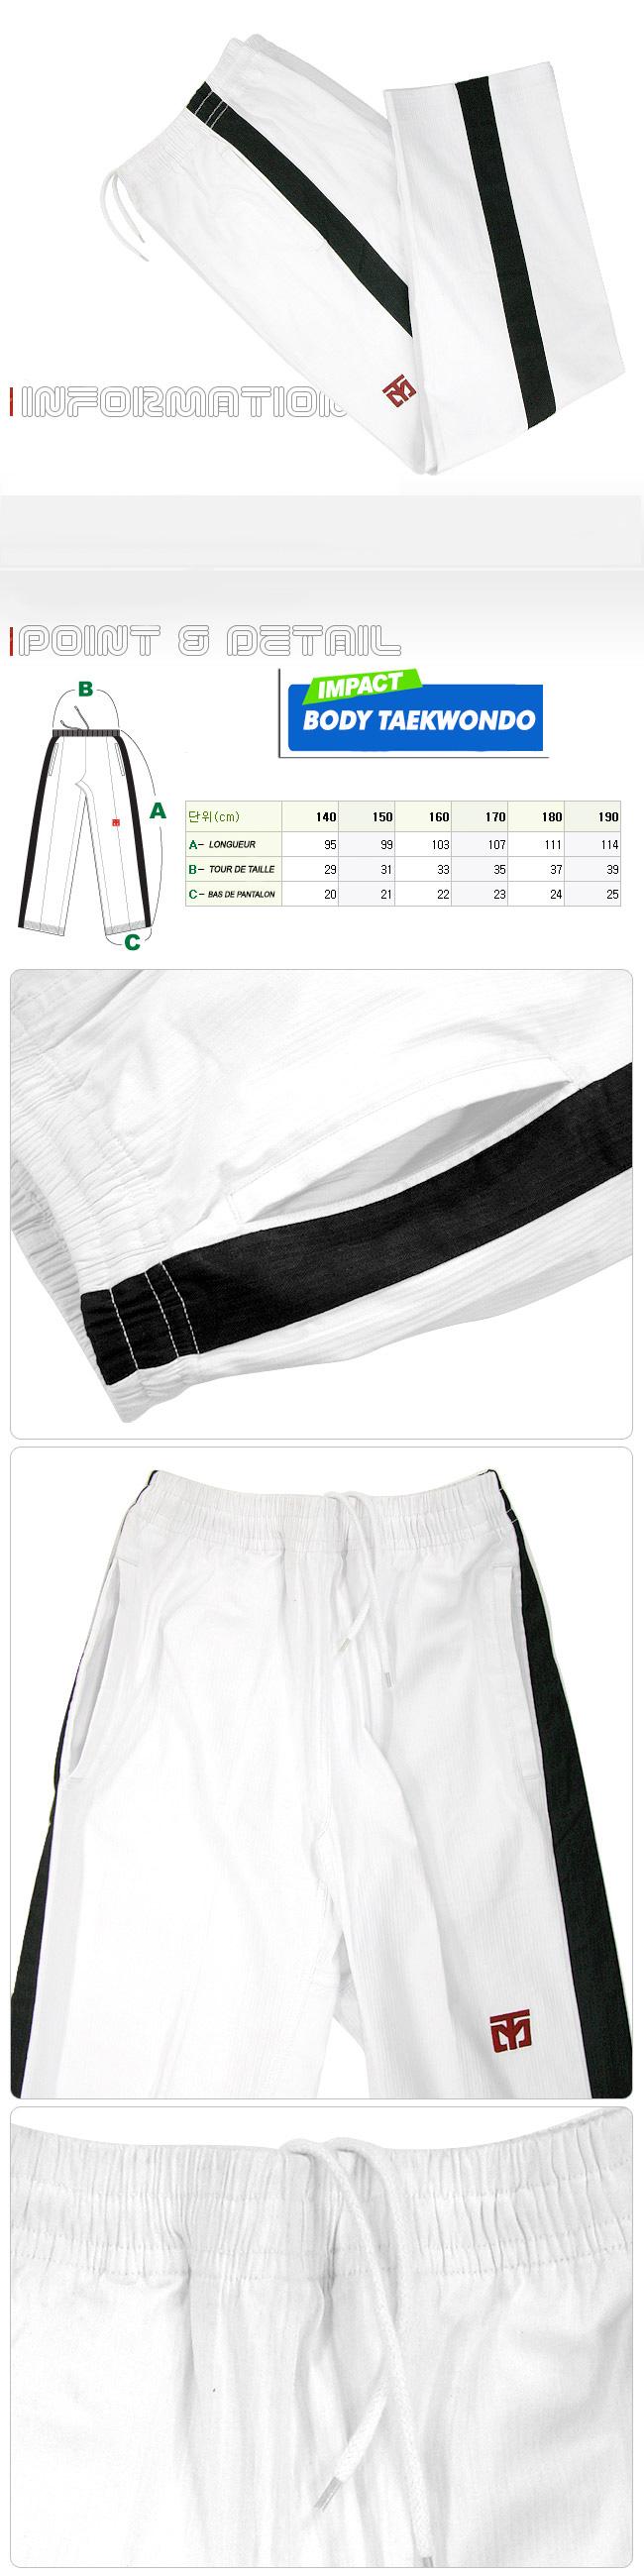 Pantalon Body Taekwondo